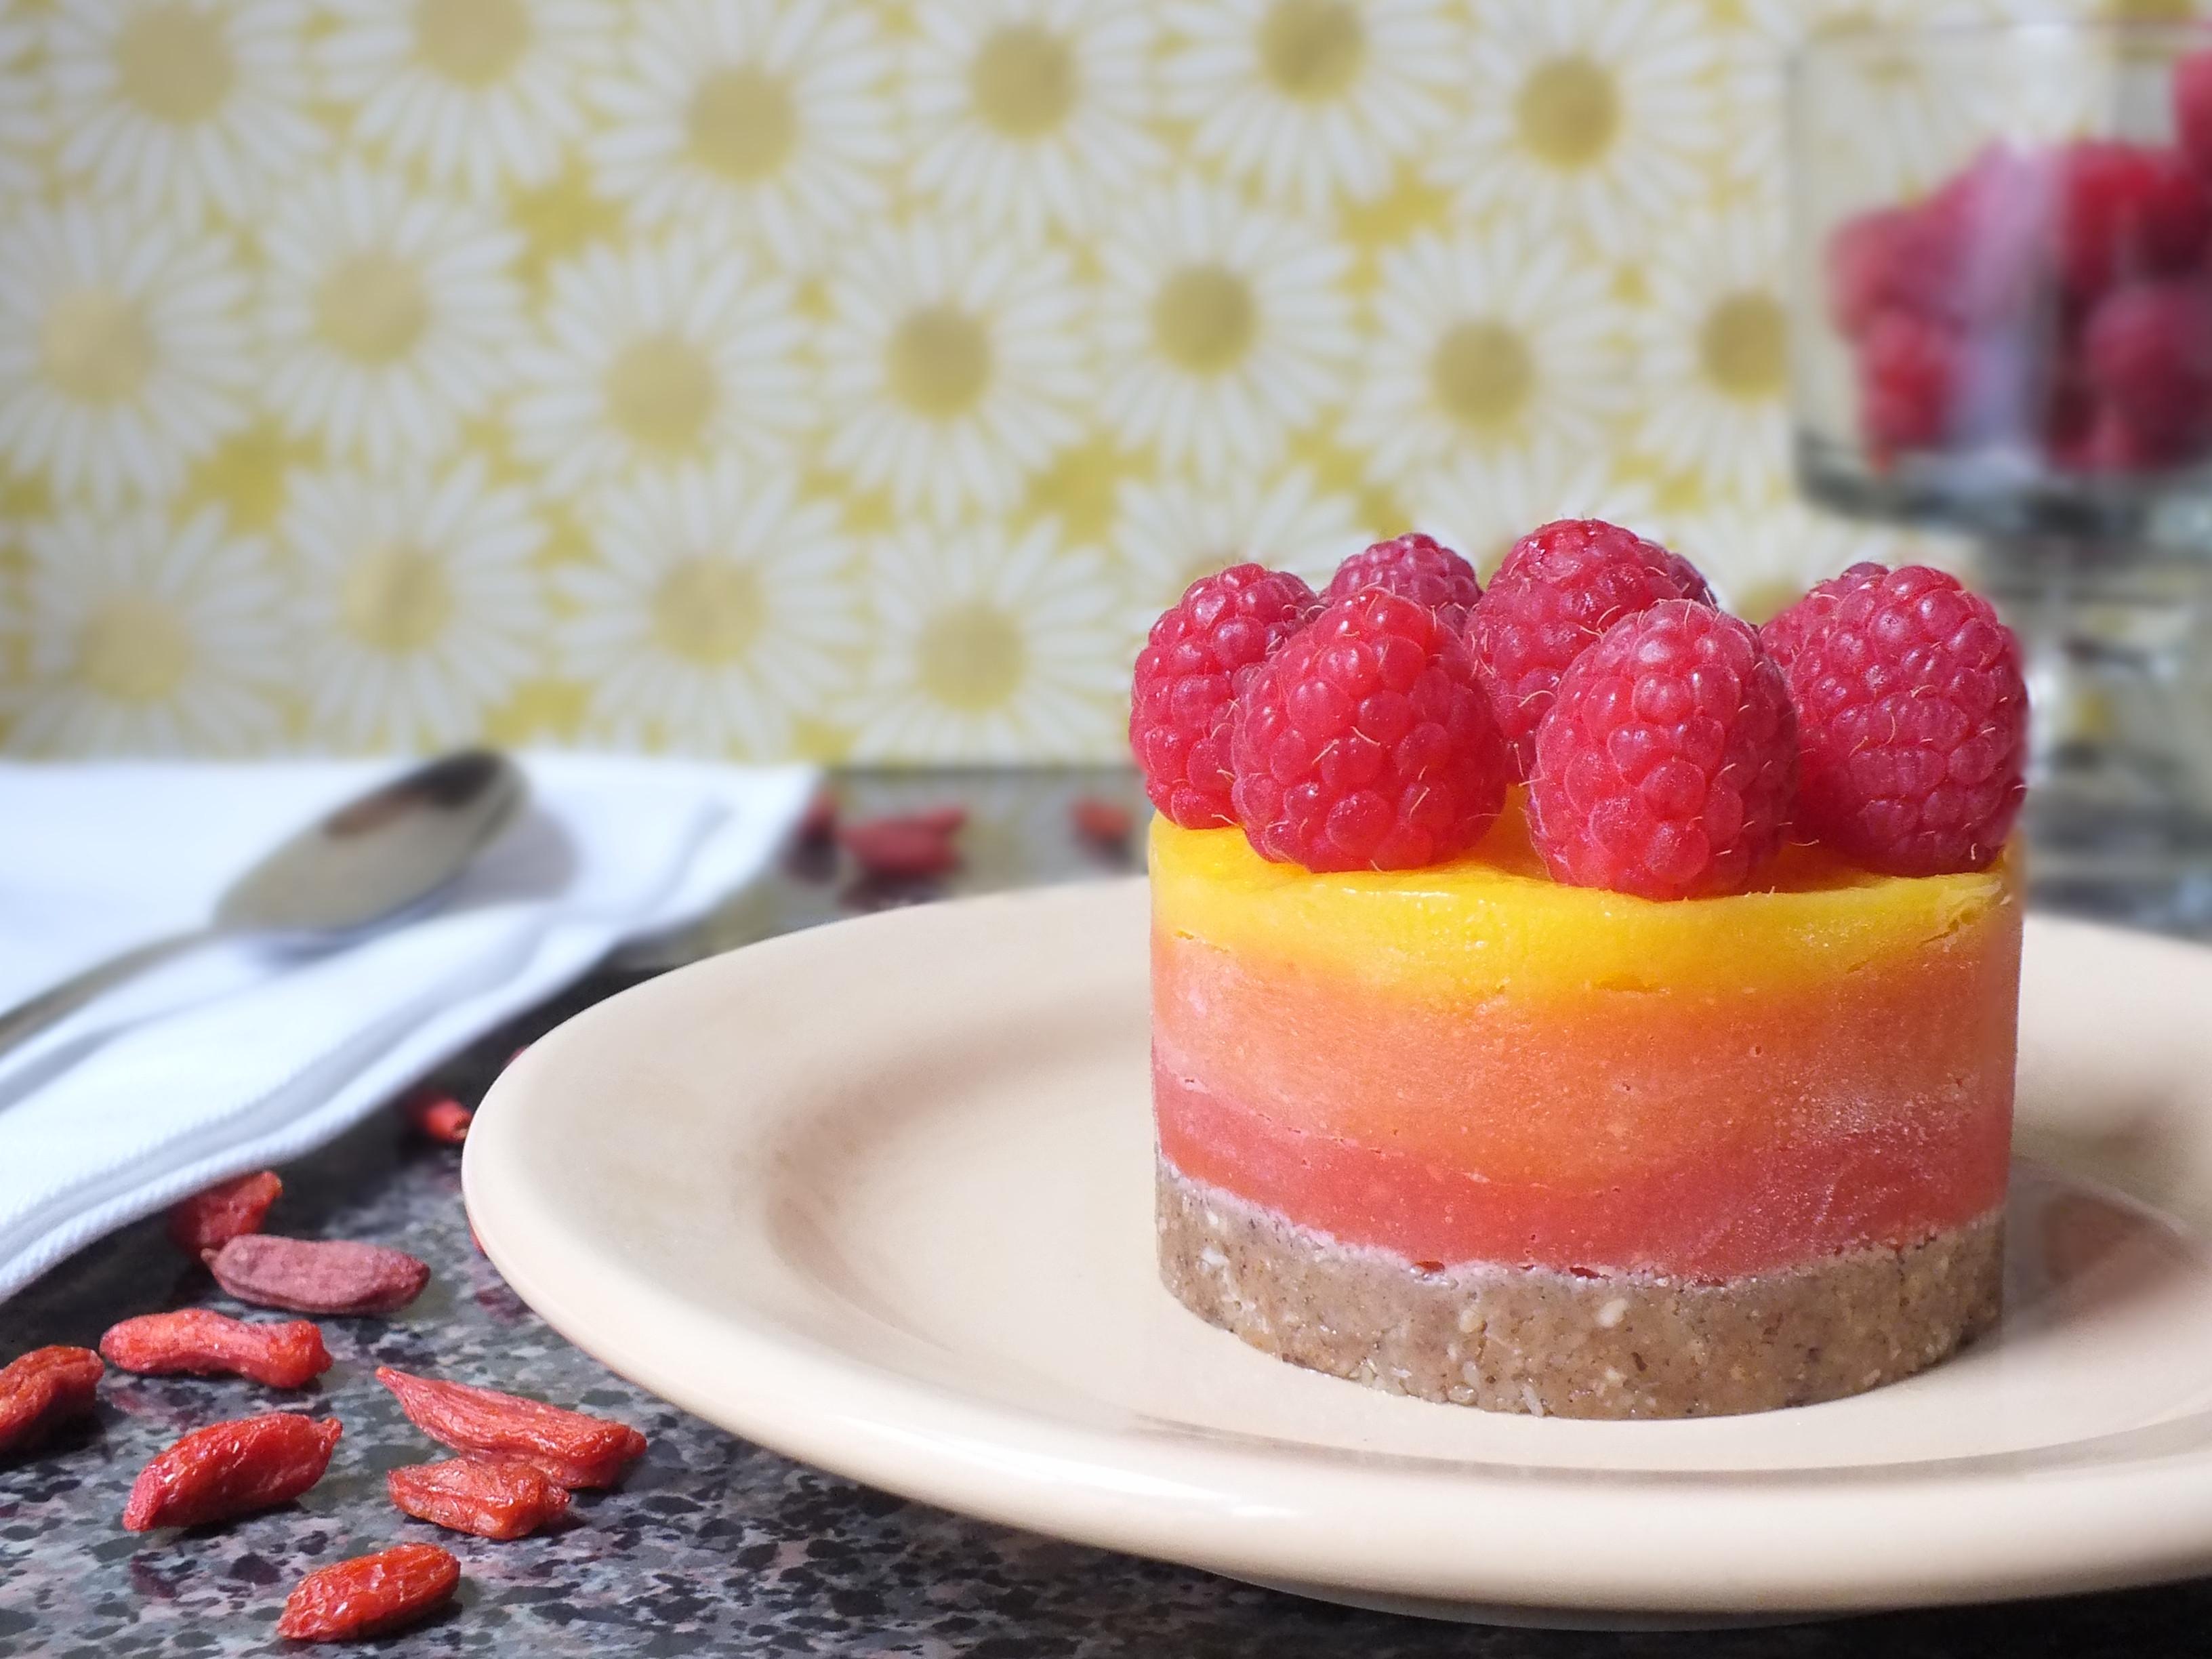 Vegan Dairy Free Desserts  Berry Mango Sunrise Tarts [Raw Gluten Free Dairy Free